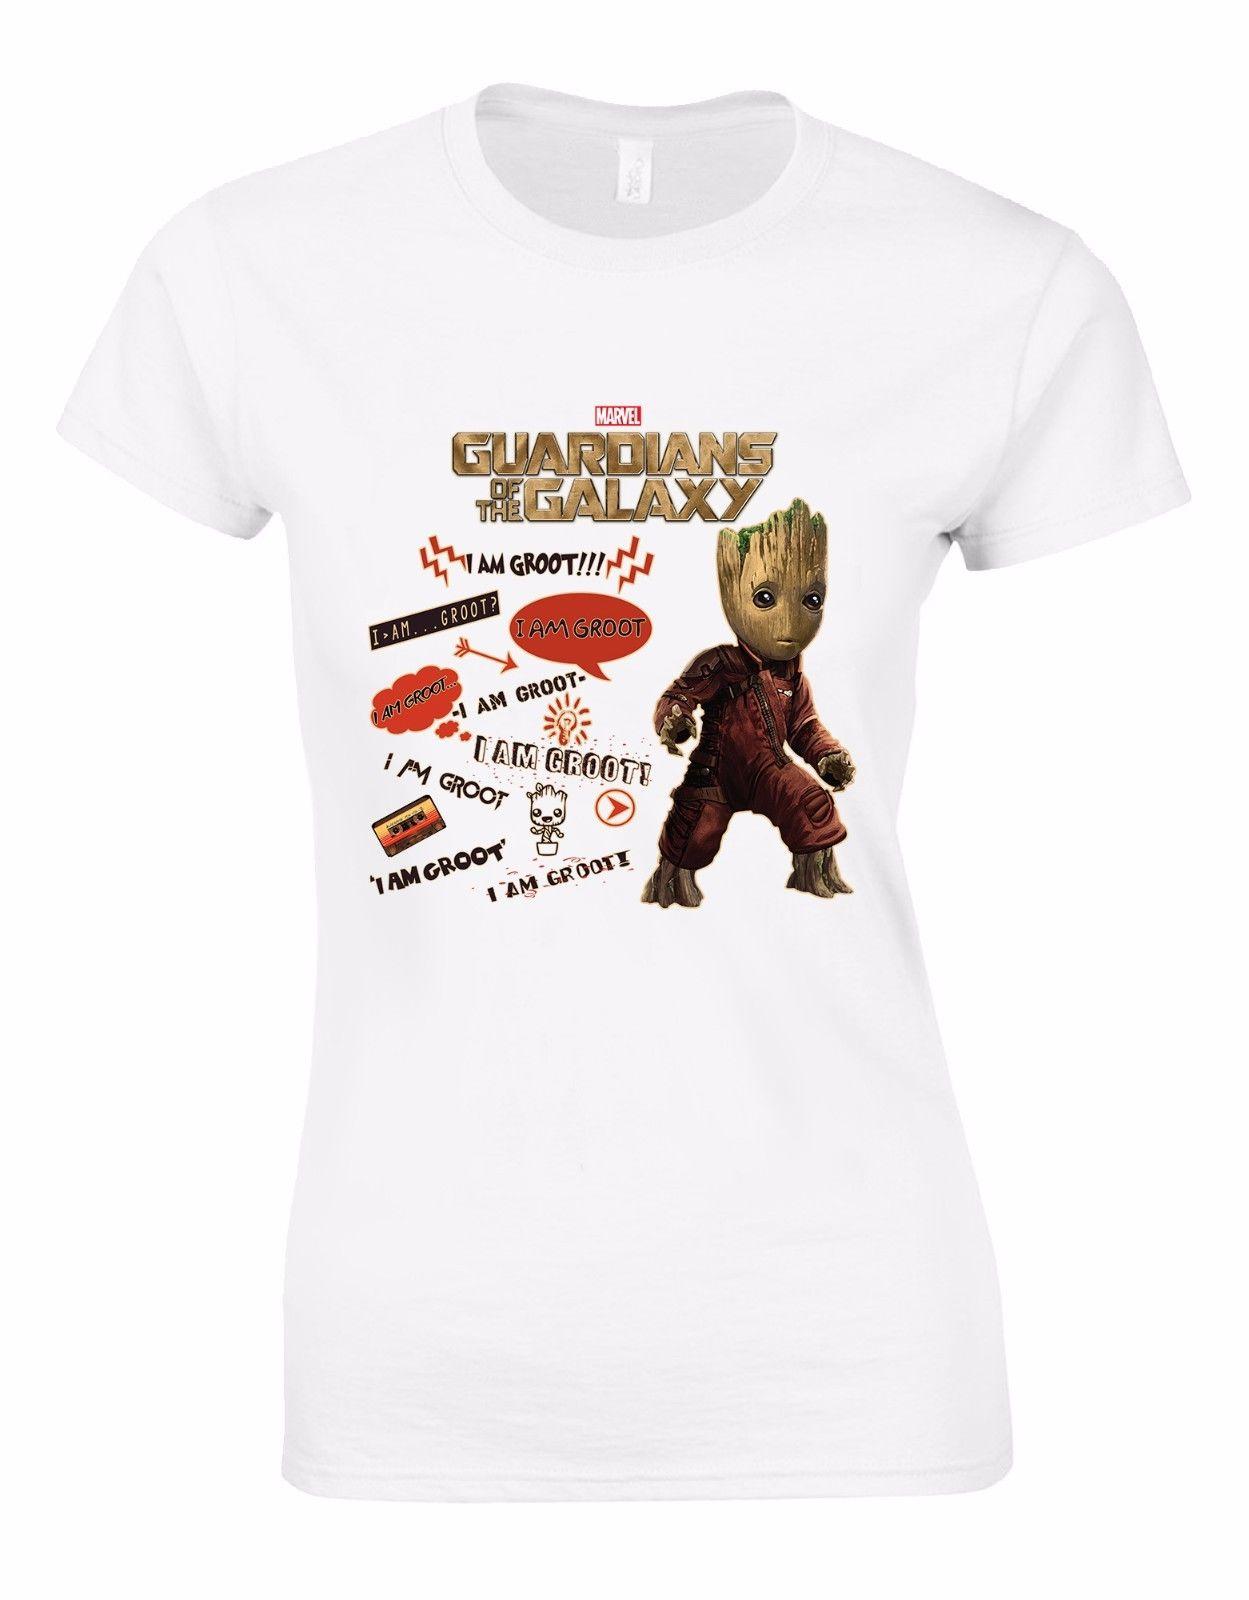 Womens Fashion T shirt Guardians of the Galaxy2 Mixtape I Am Groot Marvel Taglio Donna T-shirt Maglia